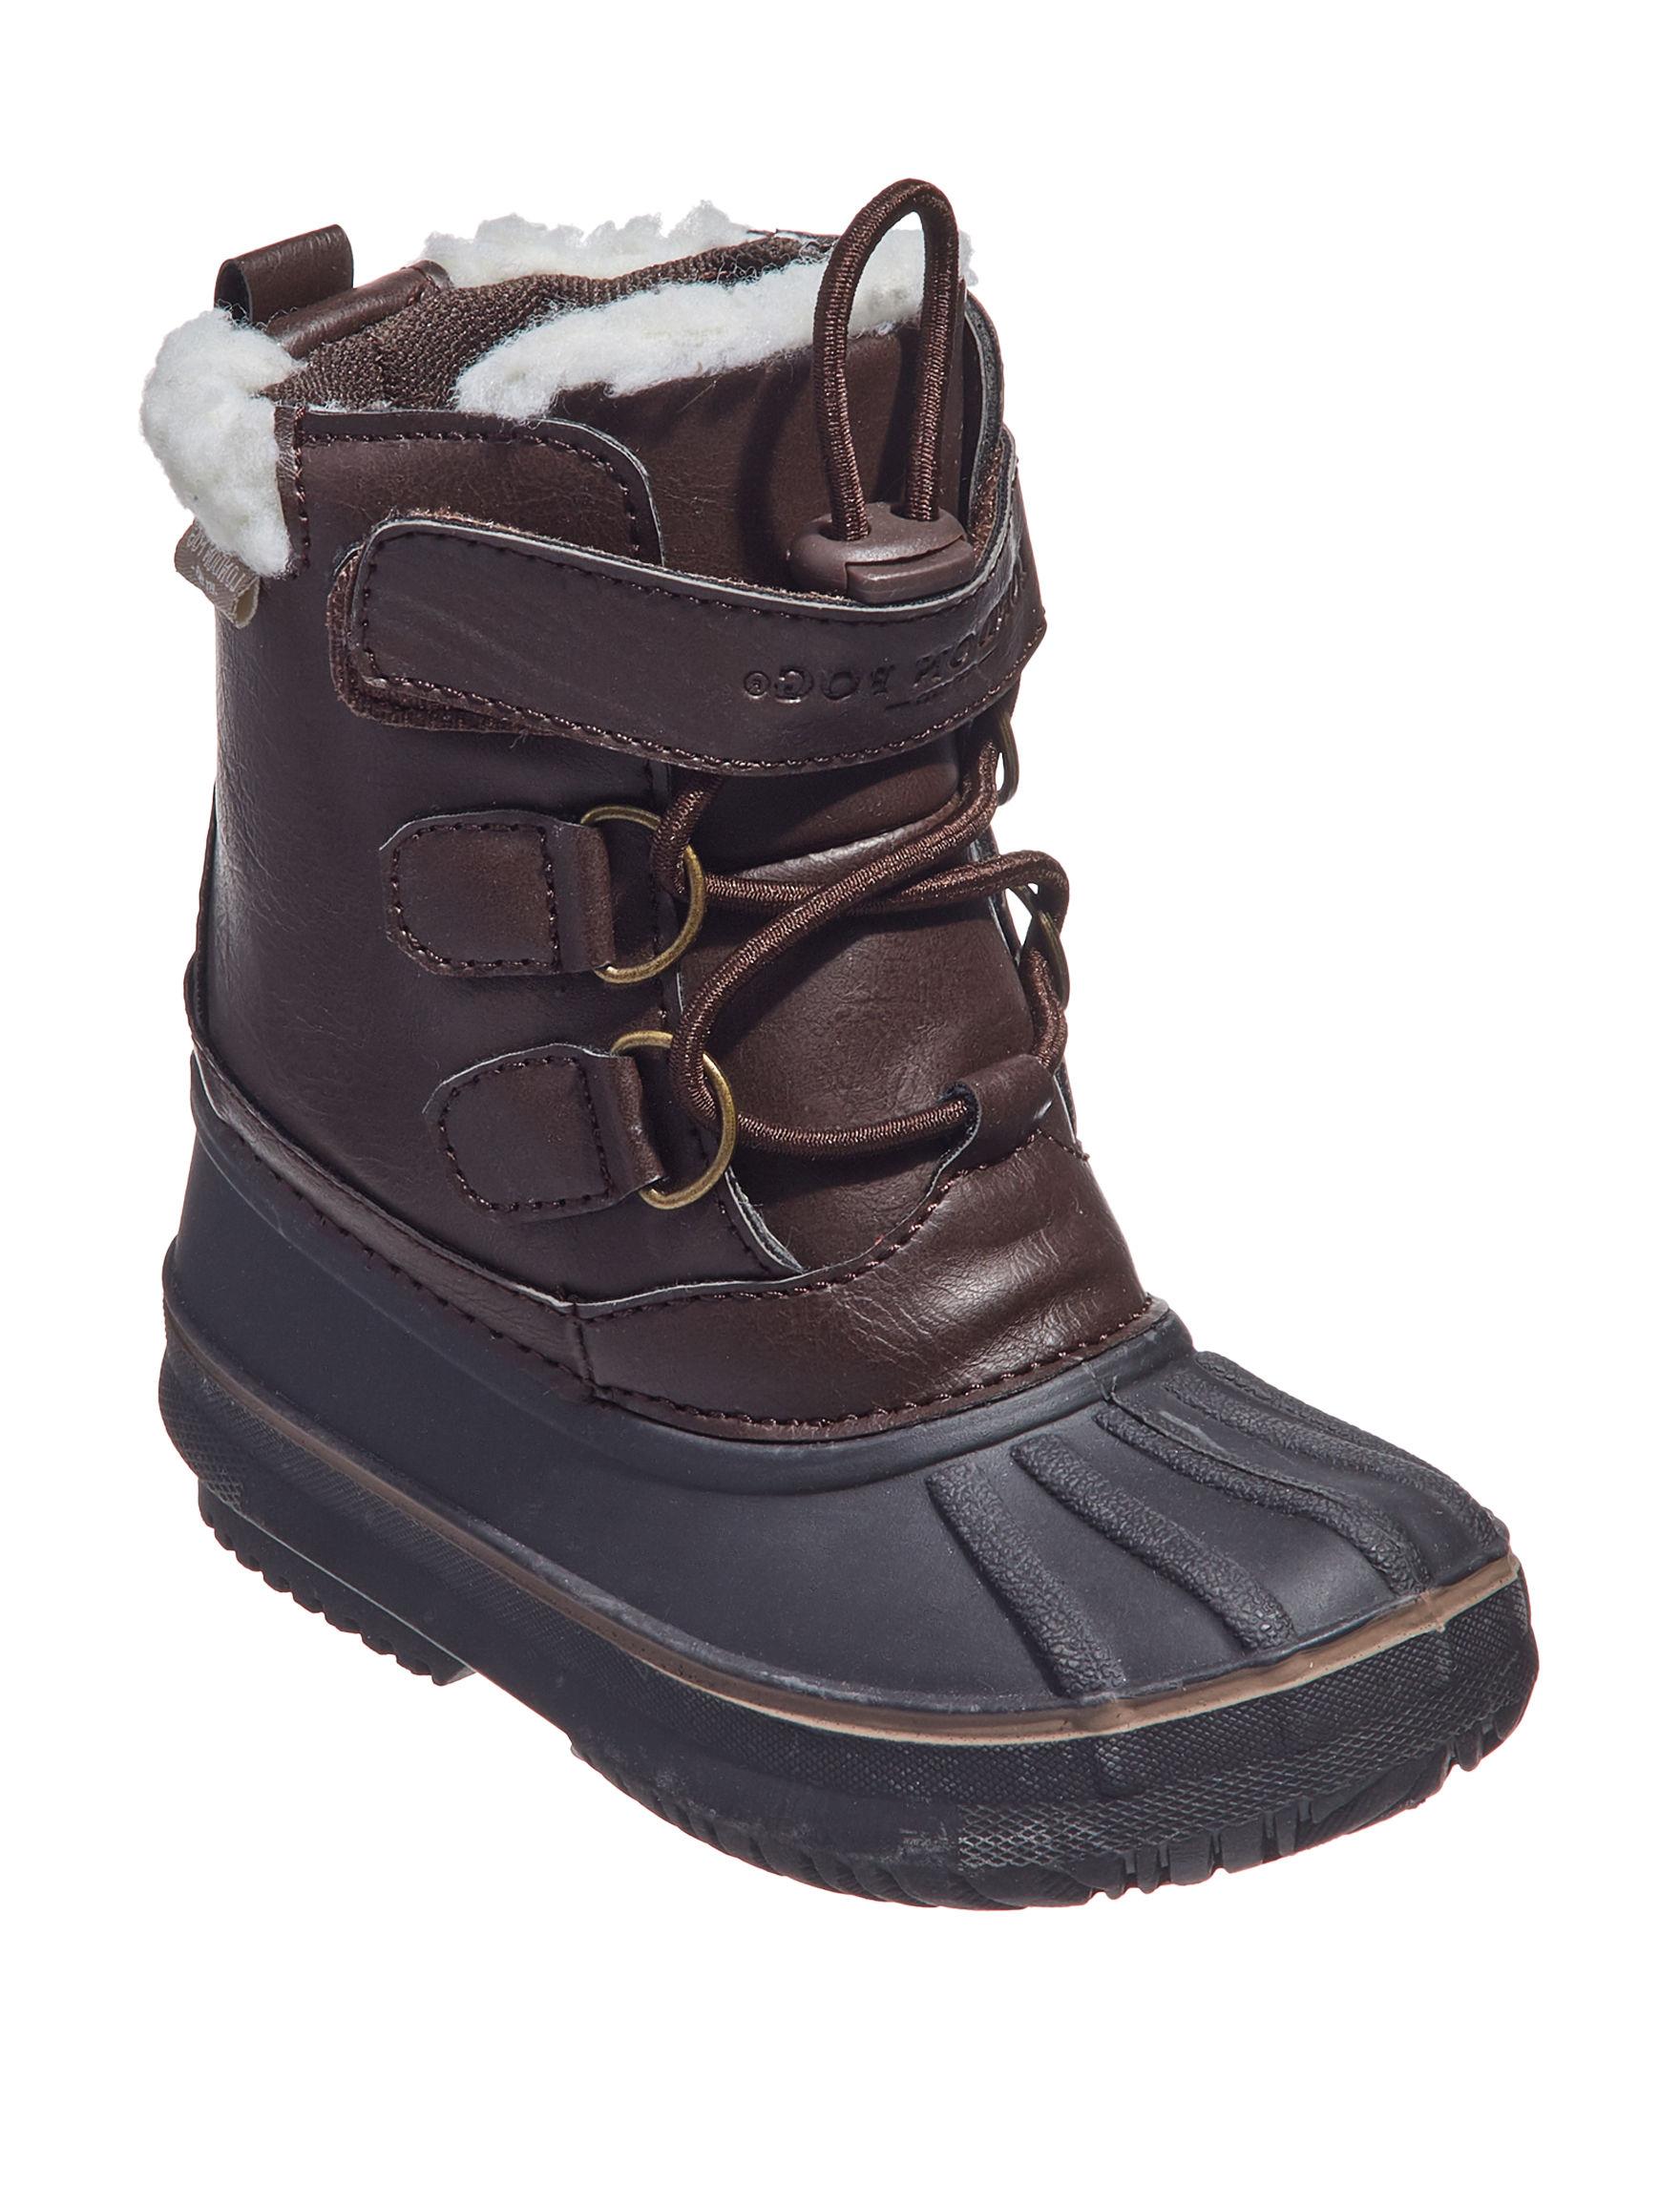 London Fog Brown Rain Boots